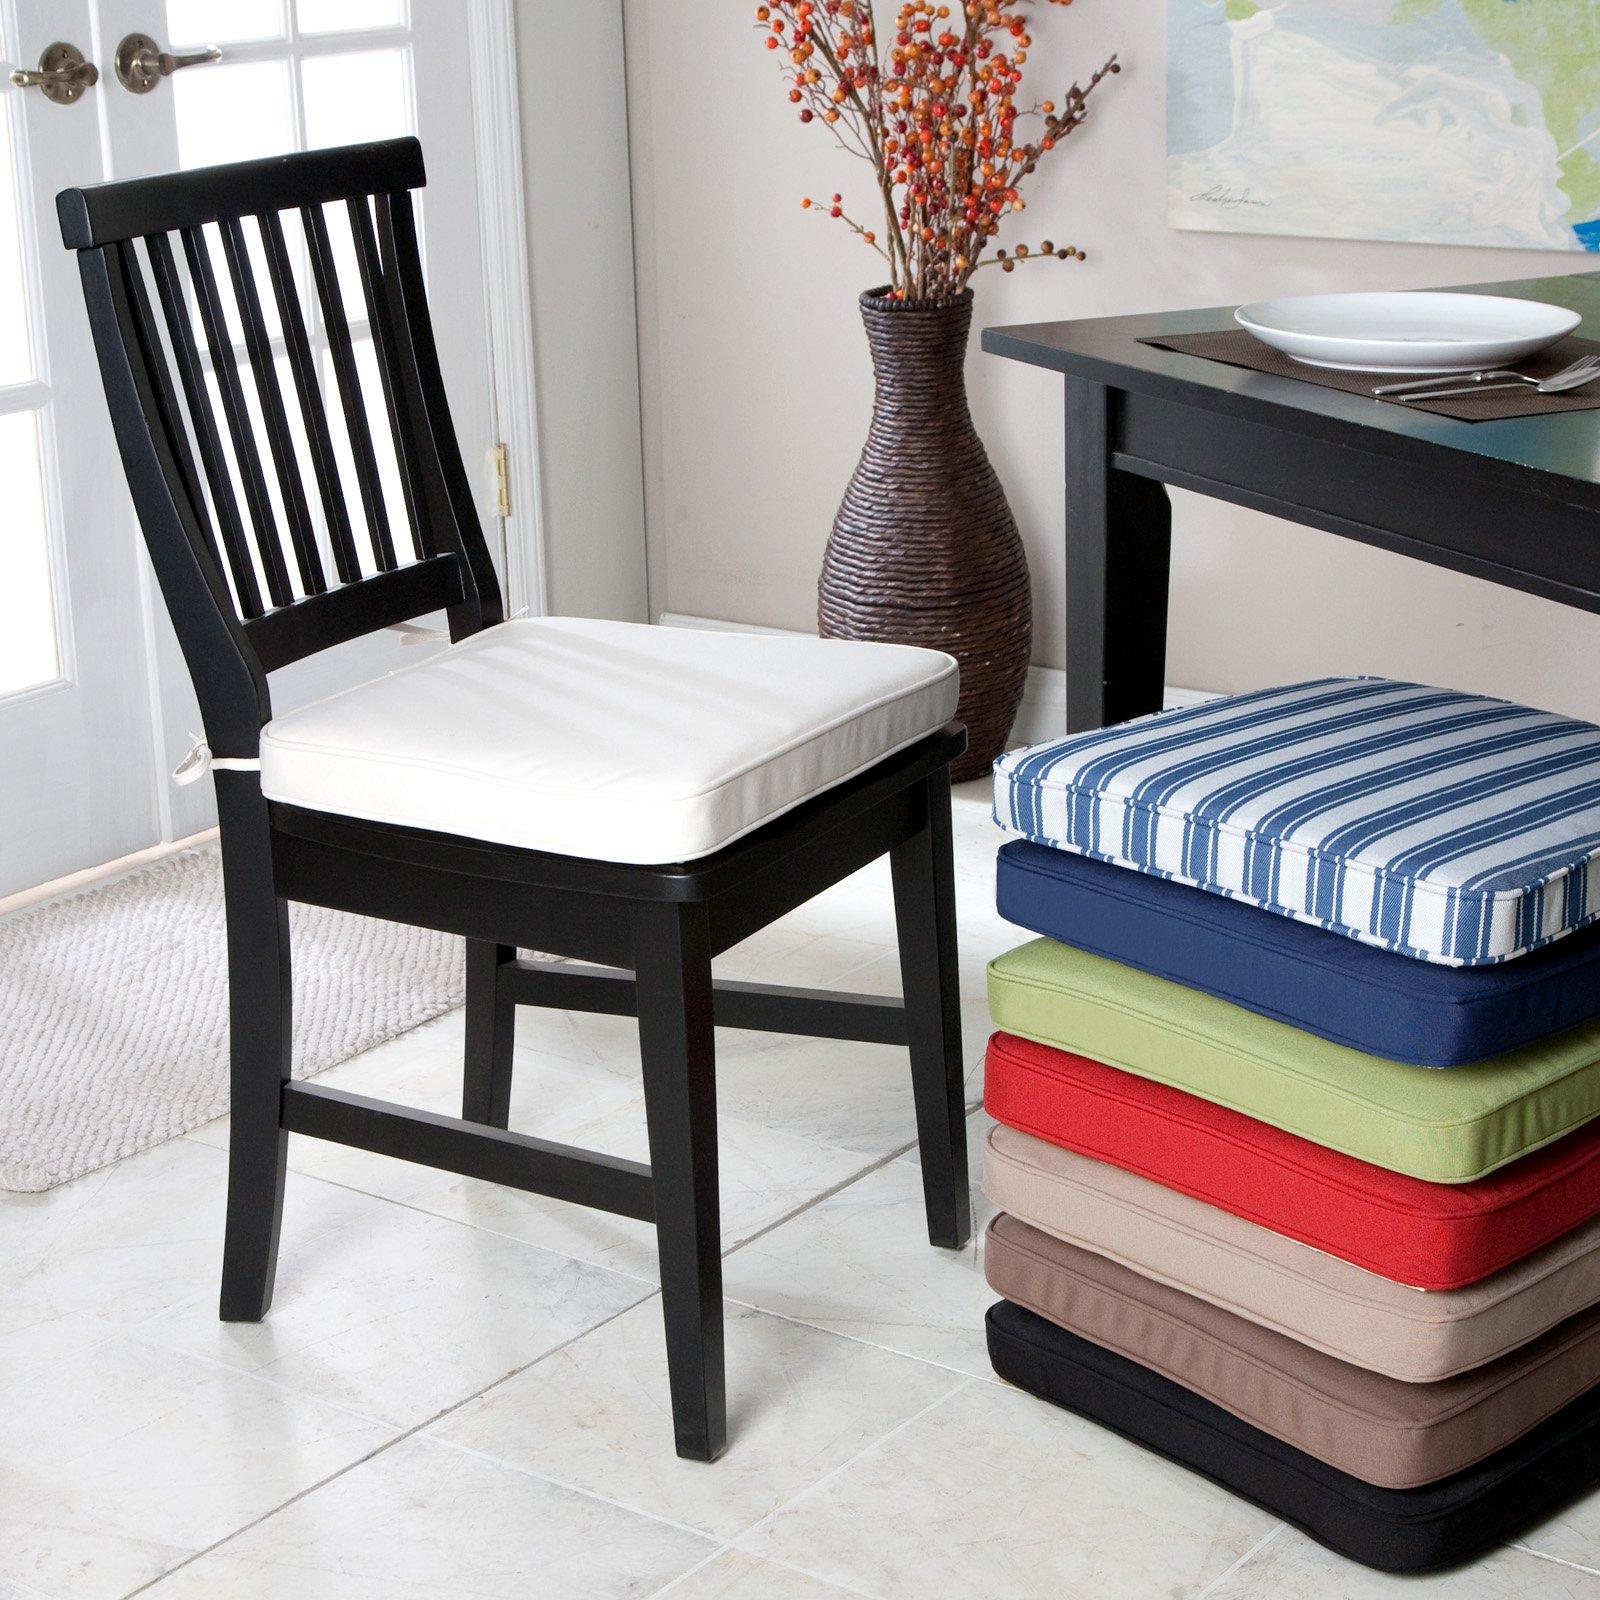 Dining Room Chair Cushion Photo